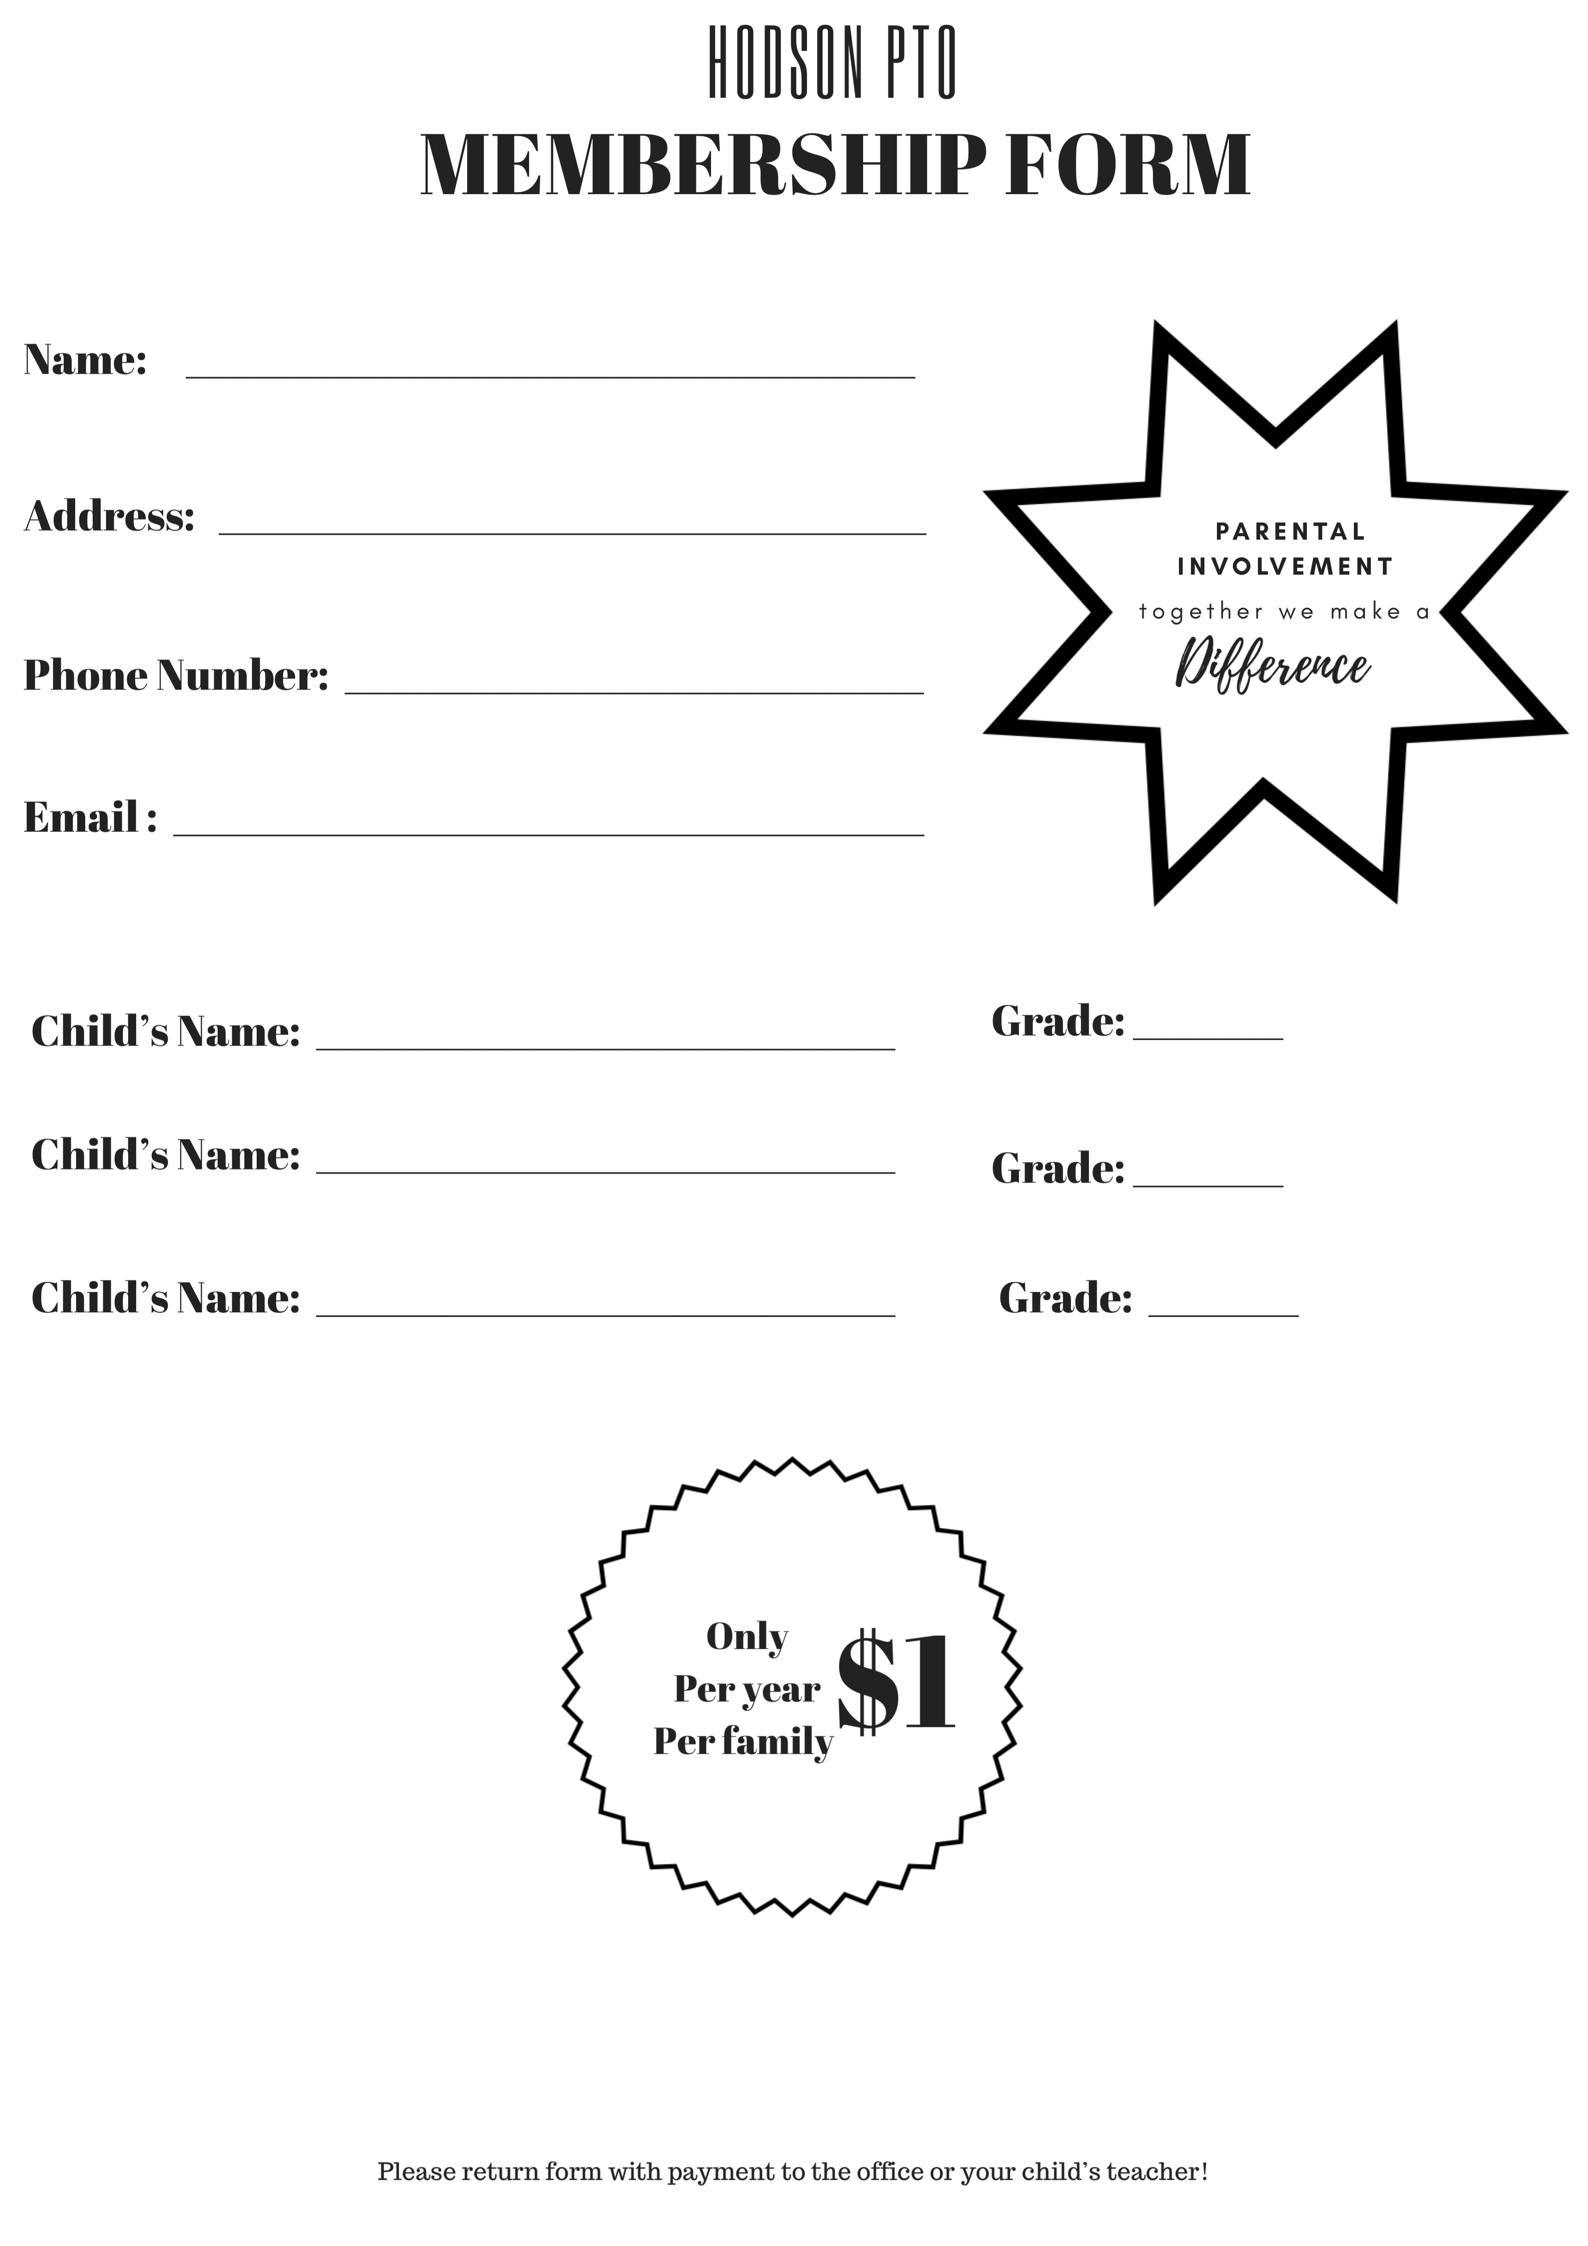 PTO Membership Form